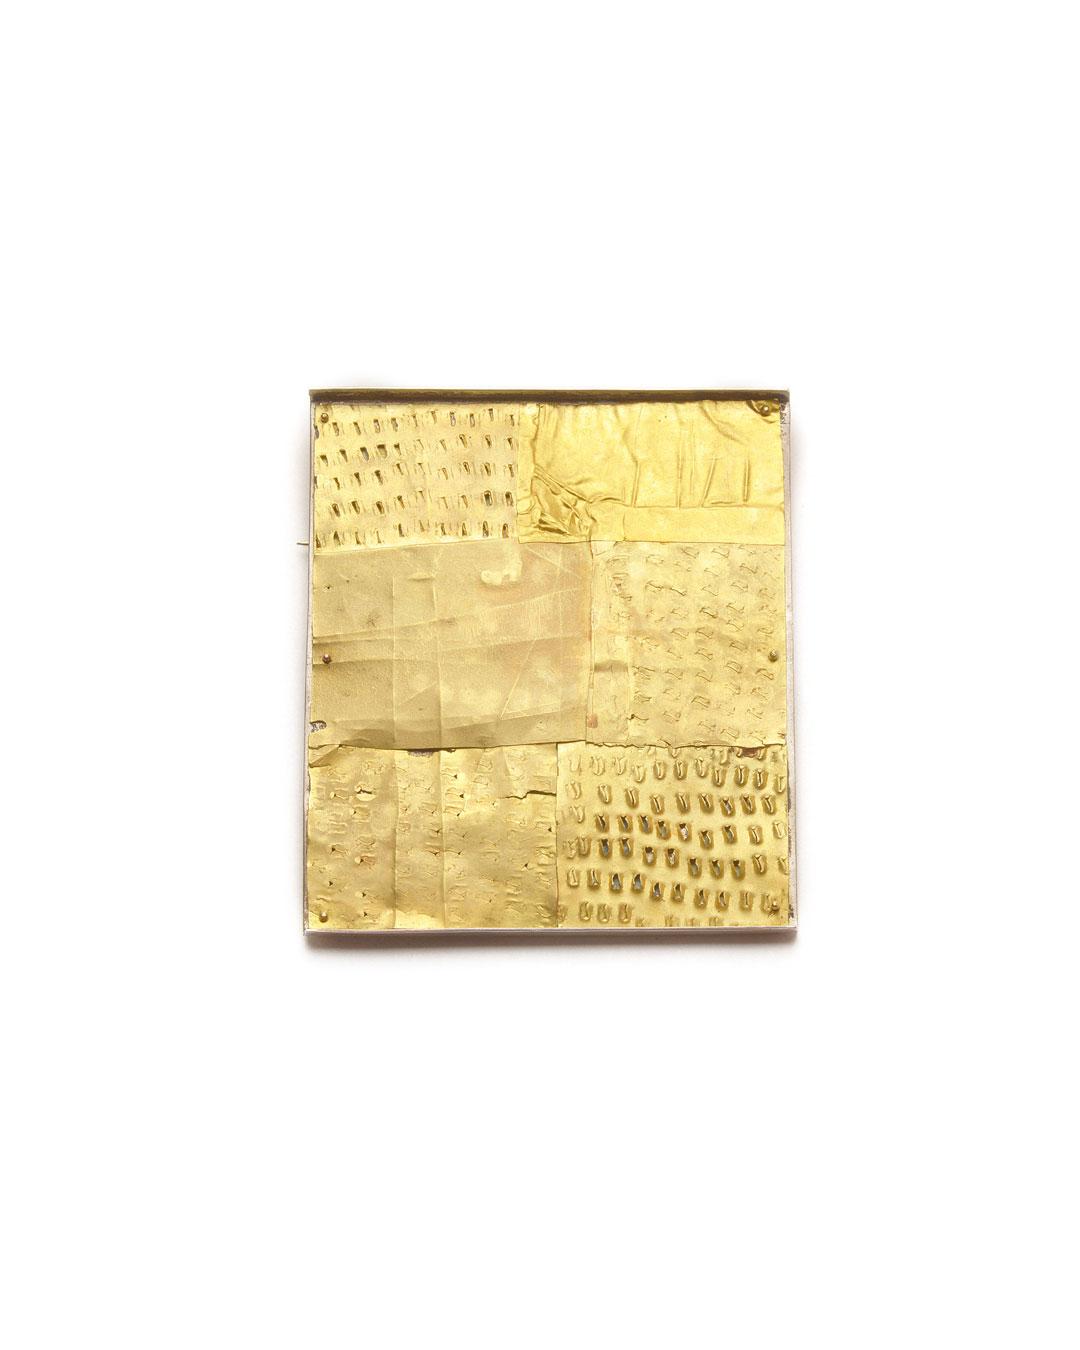 Stefano Marchetti, untitled, 2005, brooch; gold, silver, 63 x 54 x 6 mm, €6100